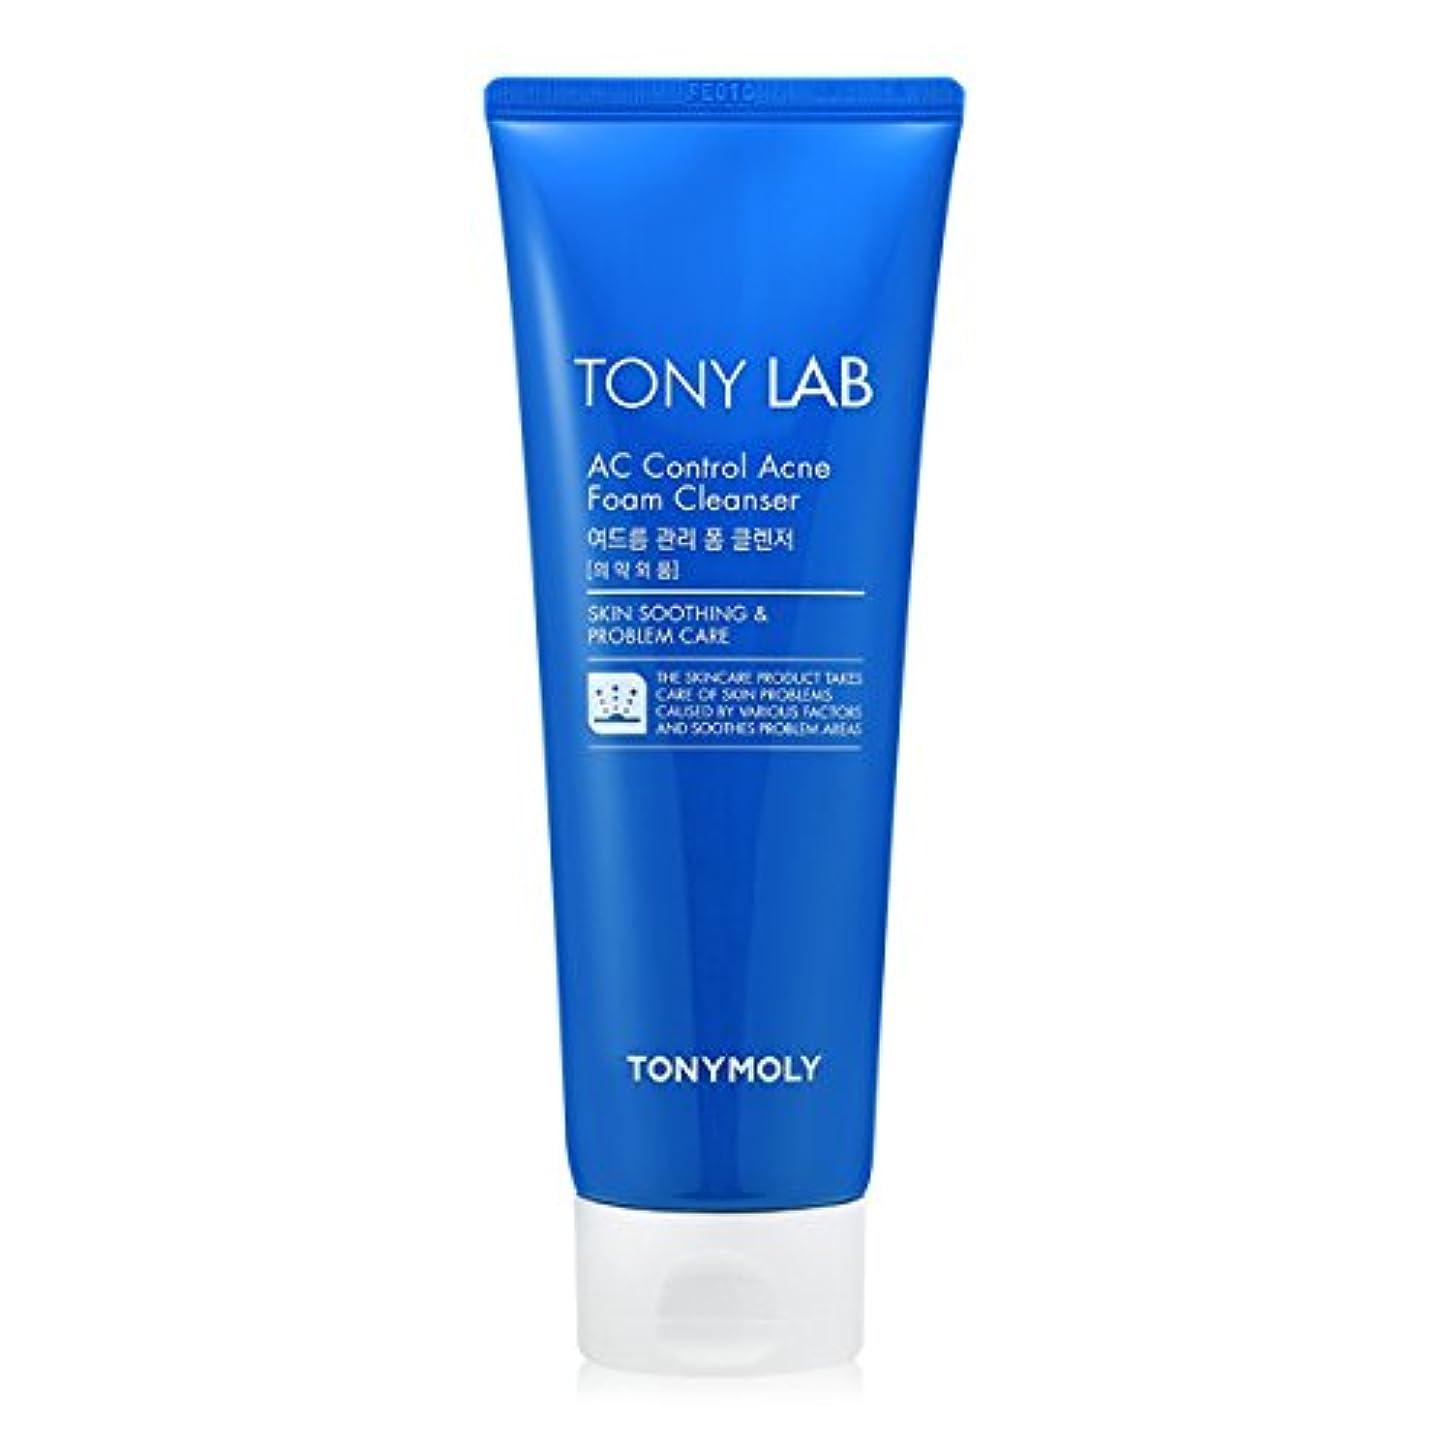 [New] TONYMOLY Tony Lab AC Control Acne Foam Cleanser 150ml/トニーモリー トニー ラボ AC コントロール アクネ フォーム クレンザー 150ml [並行輸入品]